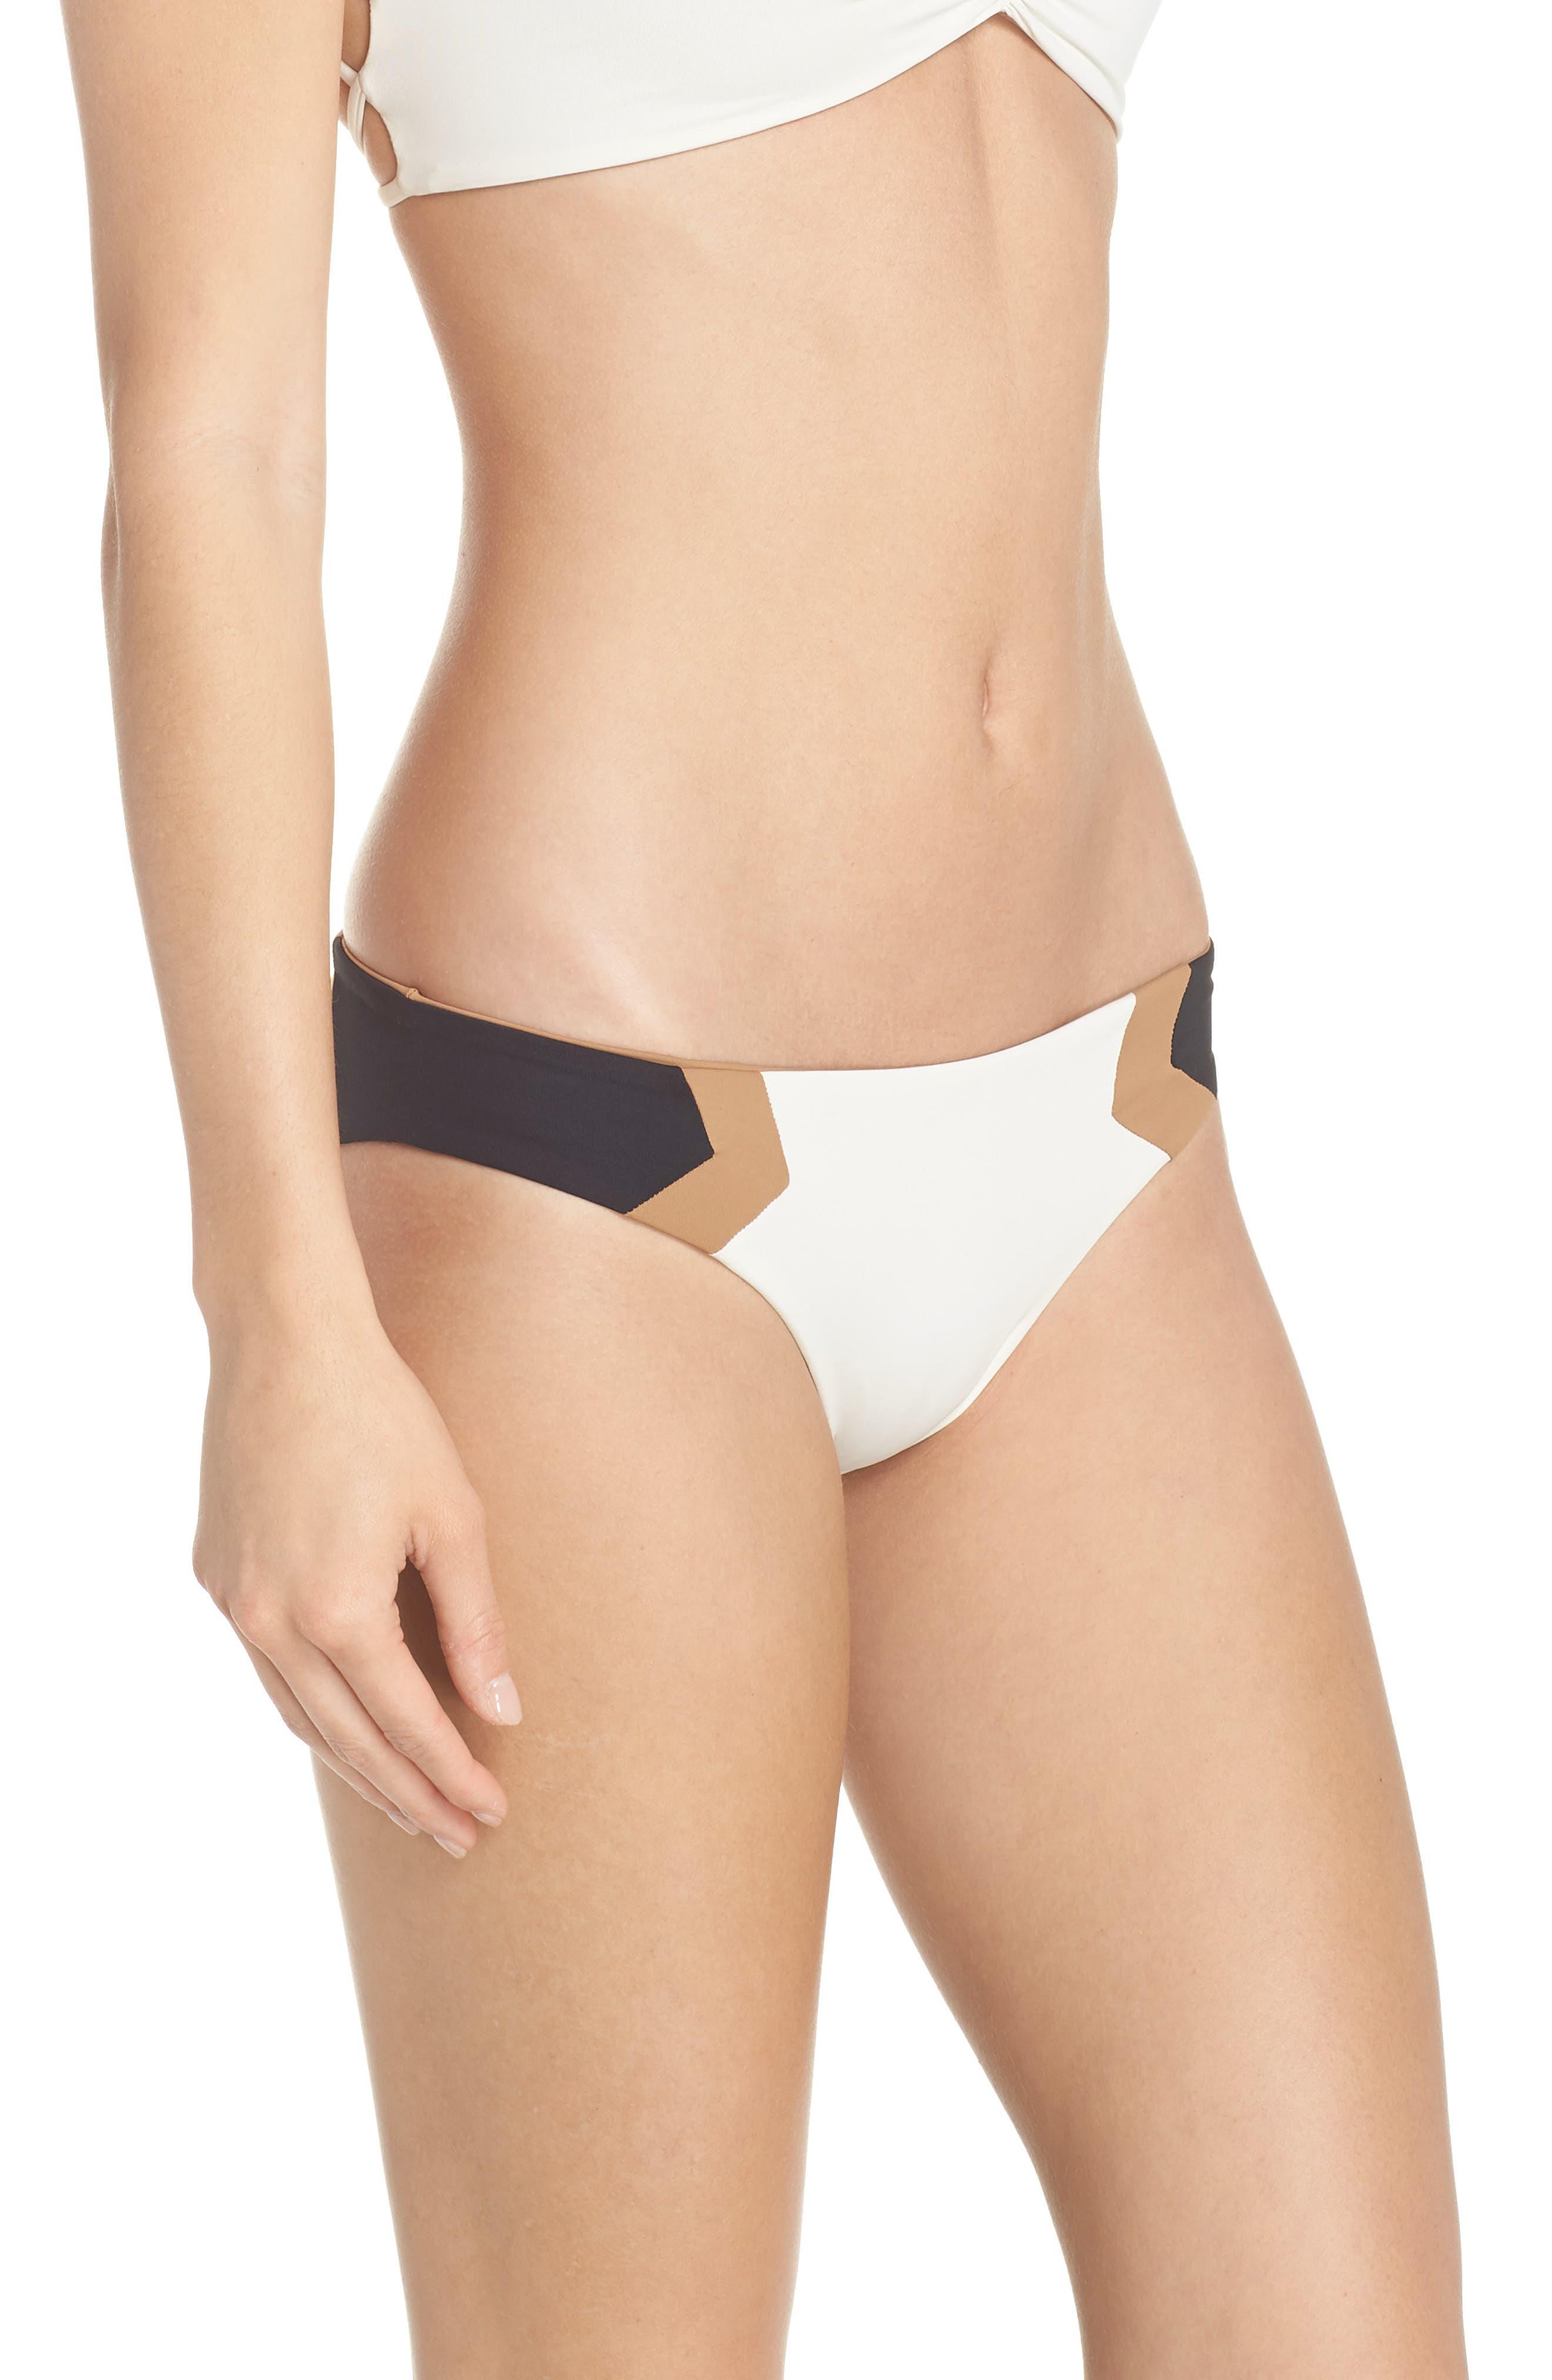 Baracuda Reversible Classic Hipster Bikini Bottoms,                             Alternate thumbnail 5, color,                             Cream/ Black/ Camel